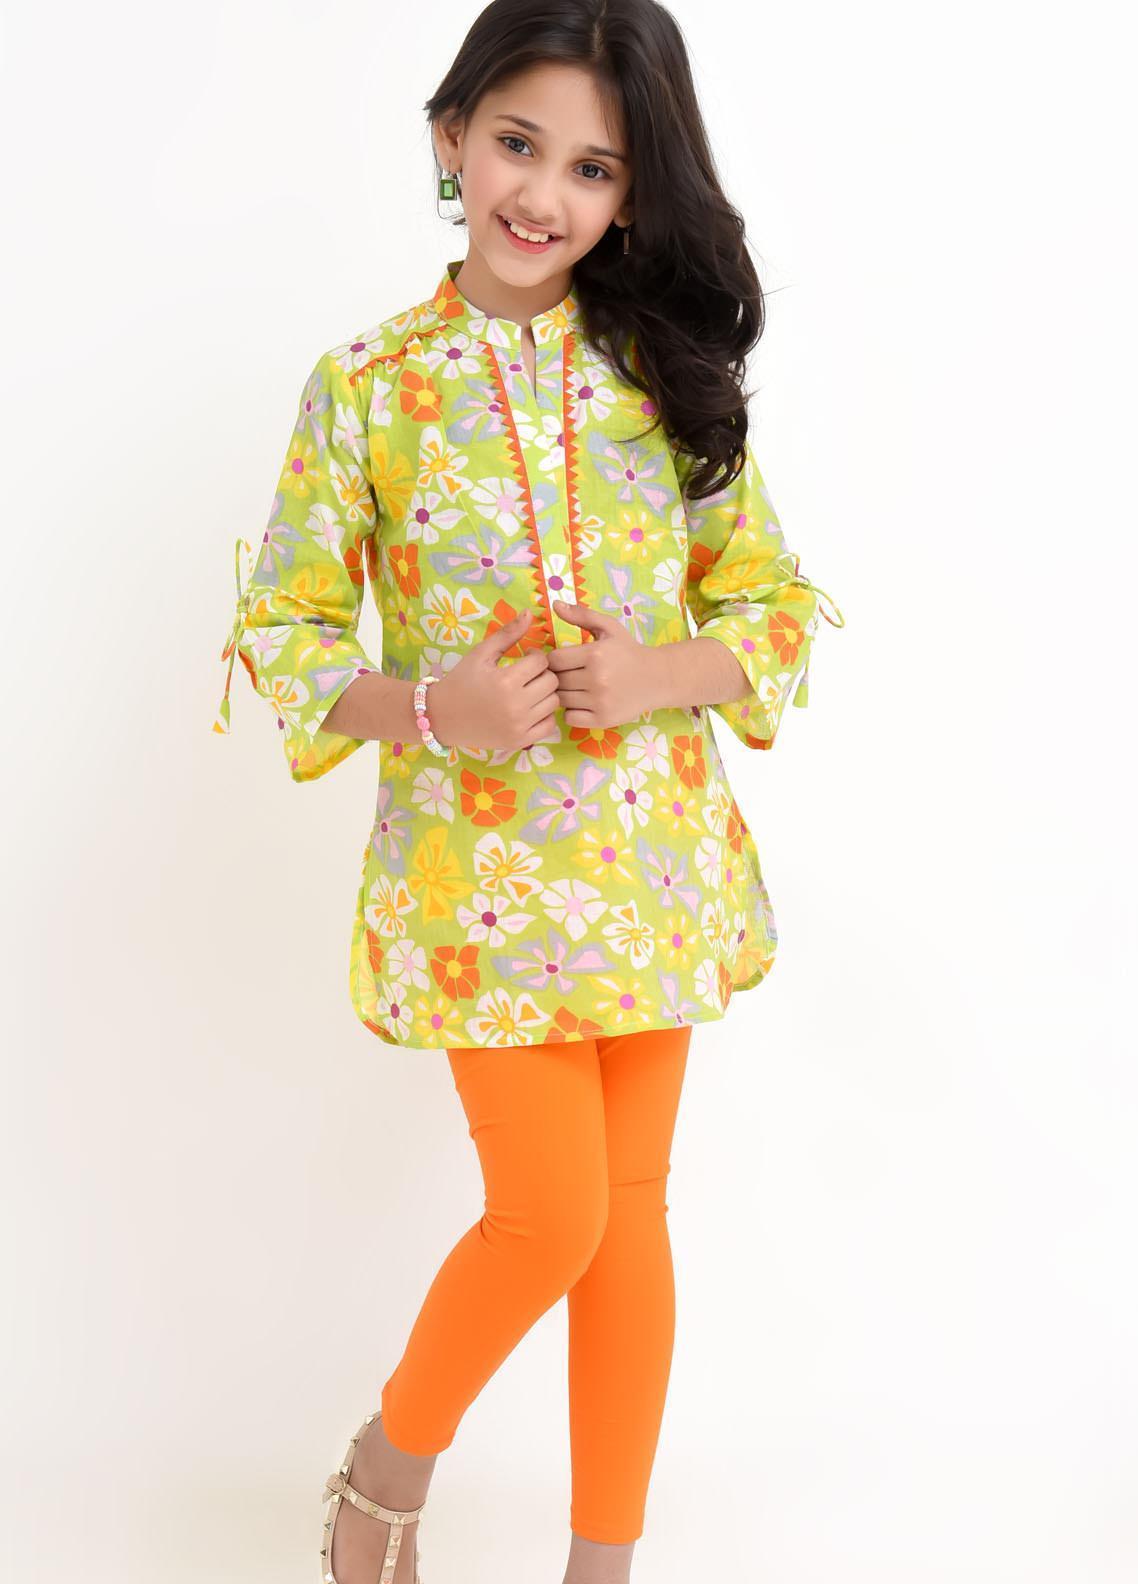 Ochre Cotton Fancy Top for Girls -  OWT-429 Lime Green